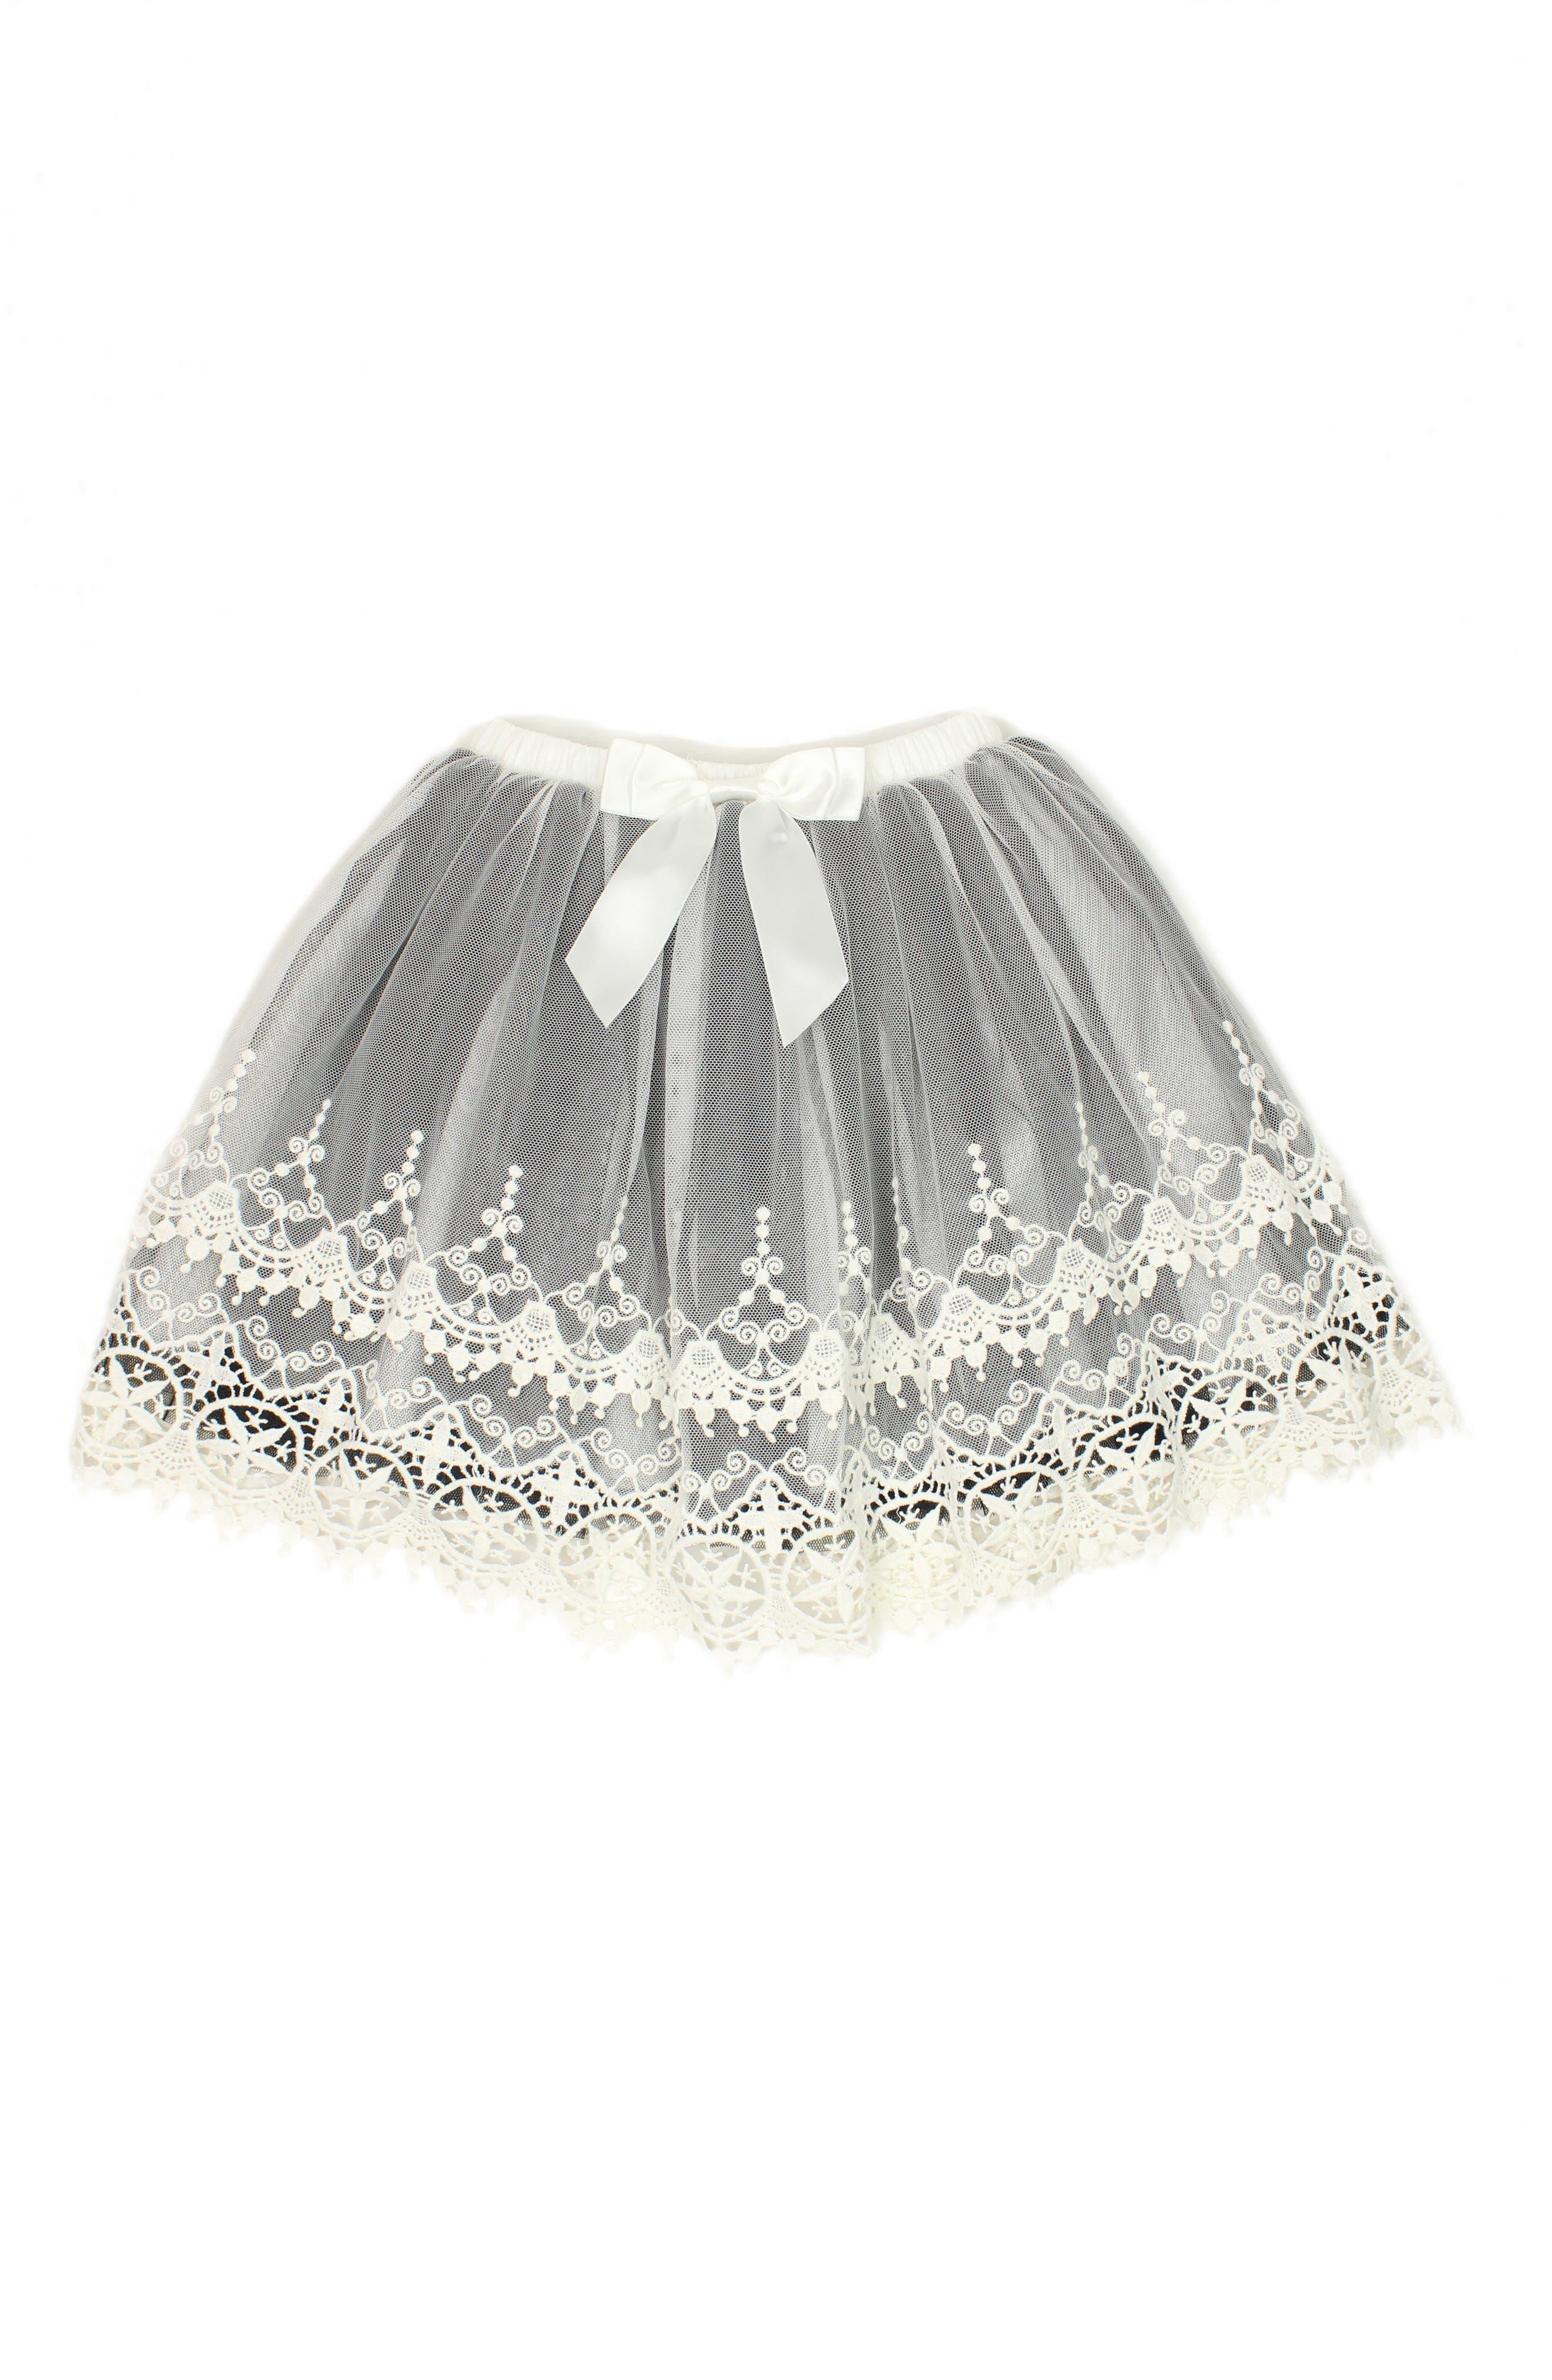 Alternate Image 1 Selected - Popatu Lace Tutu Skirt (Toddler Girls & Little Girls)